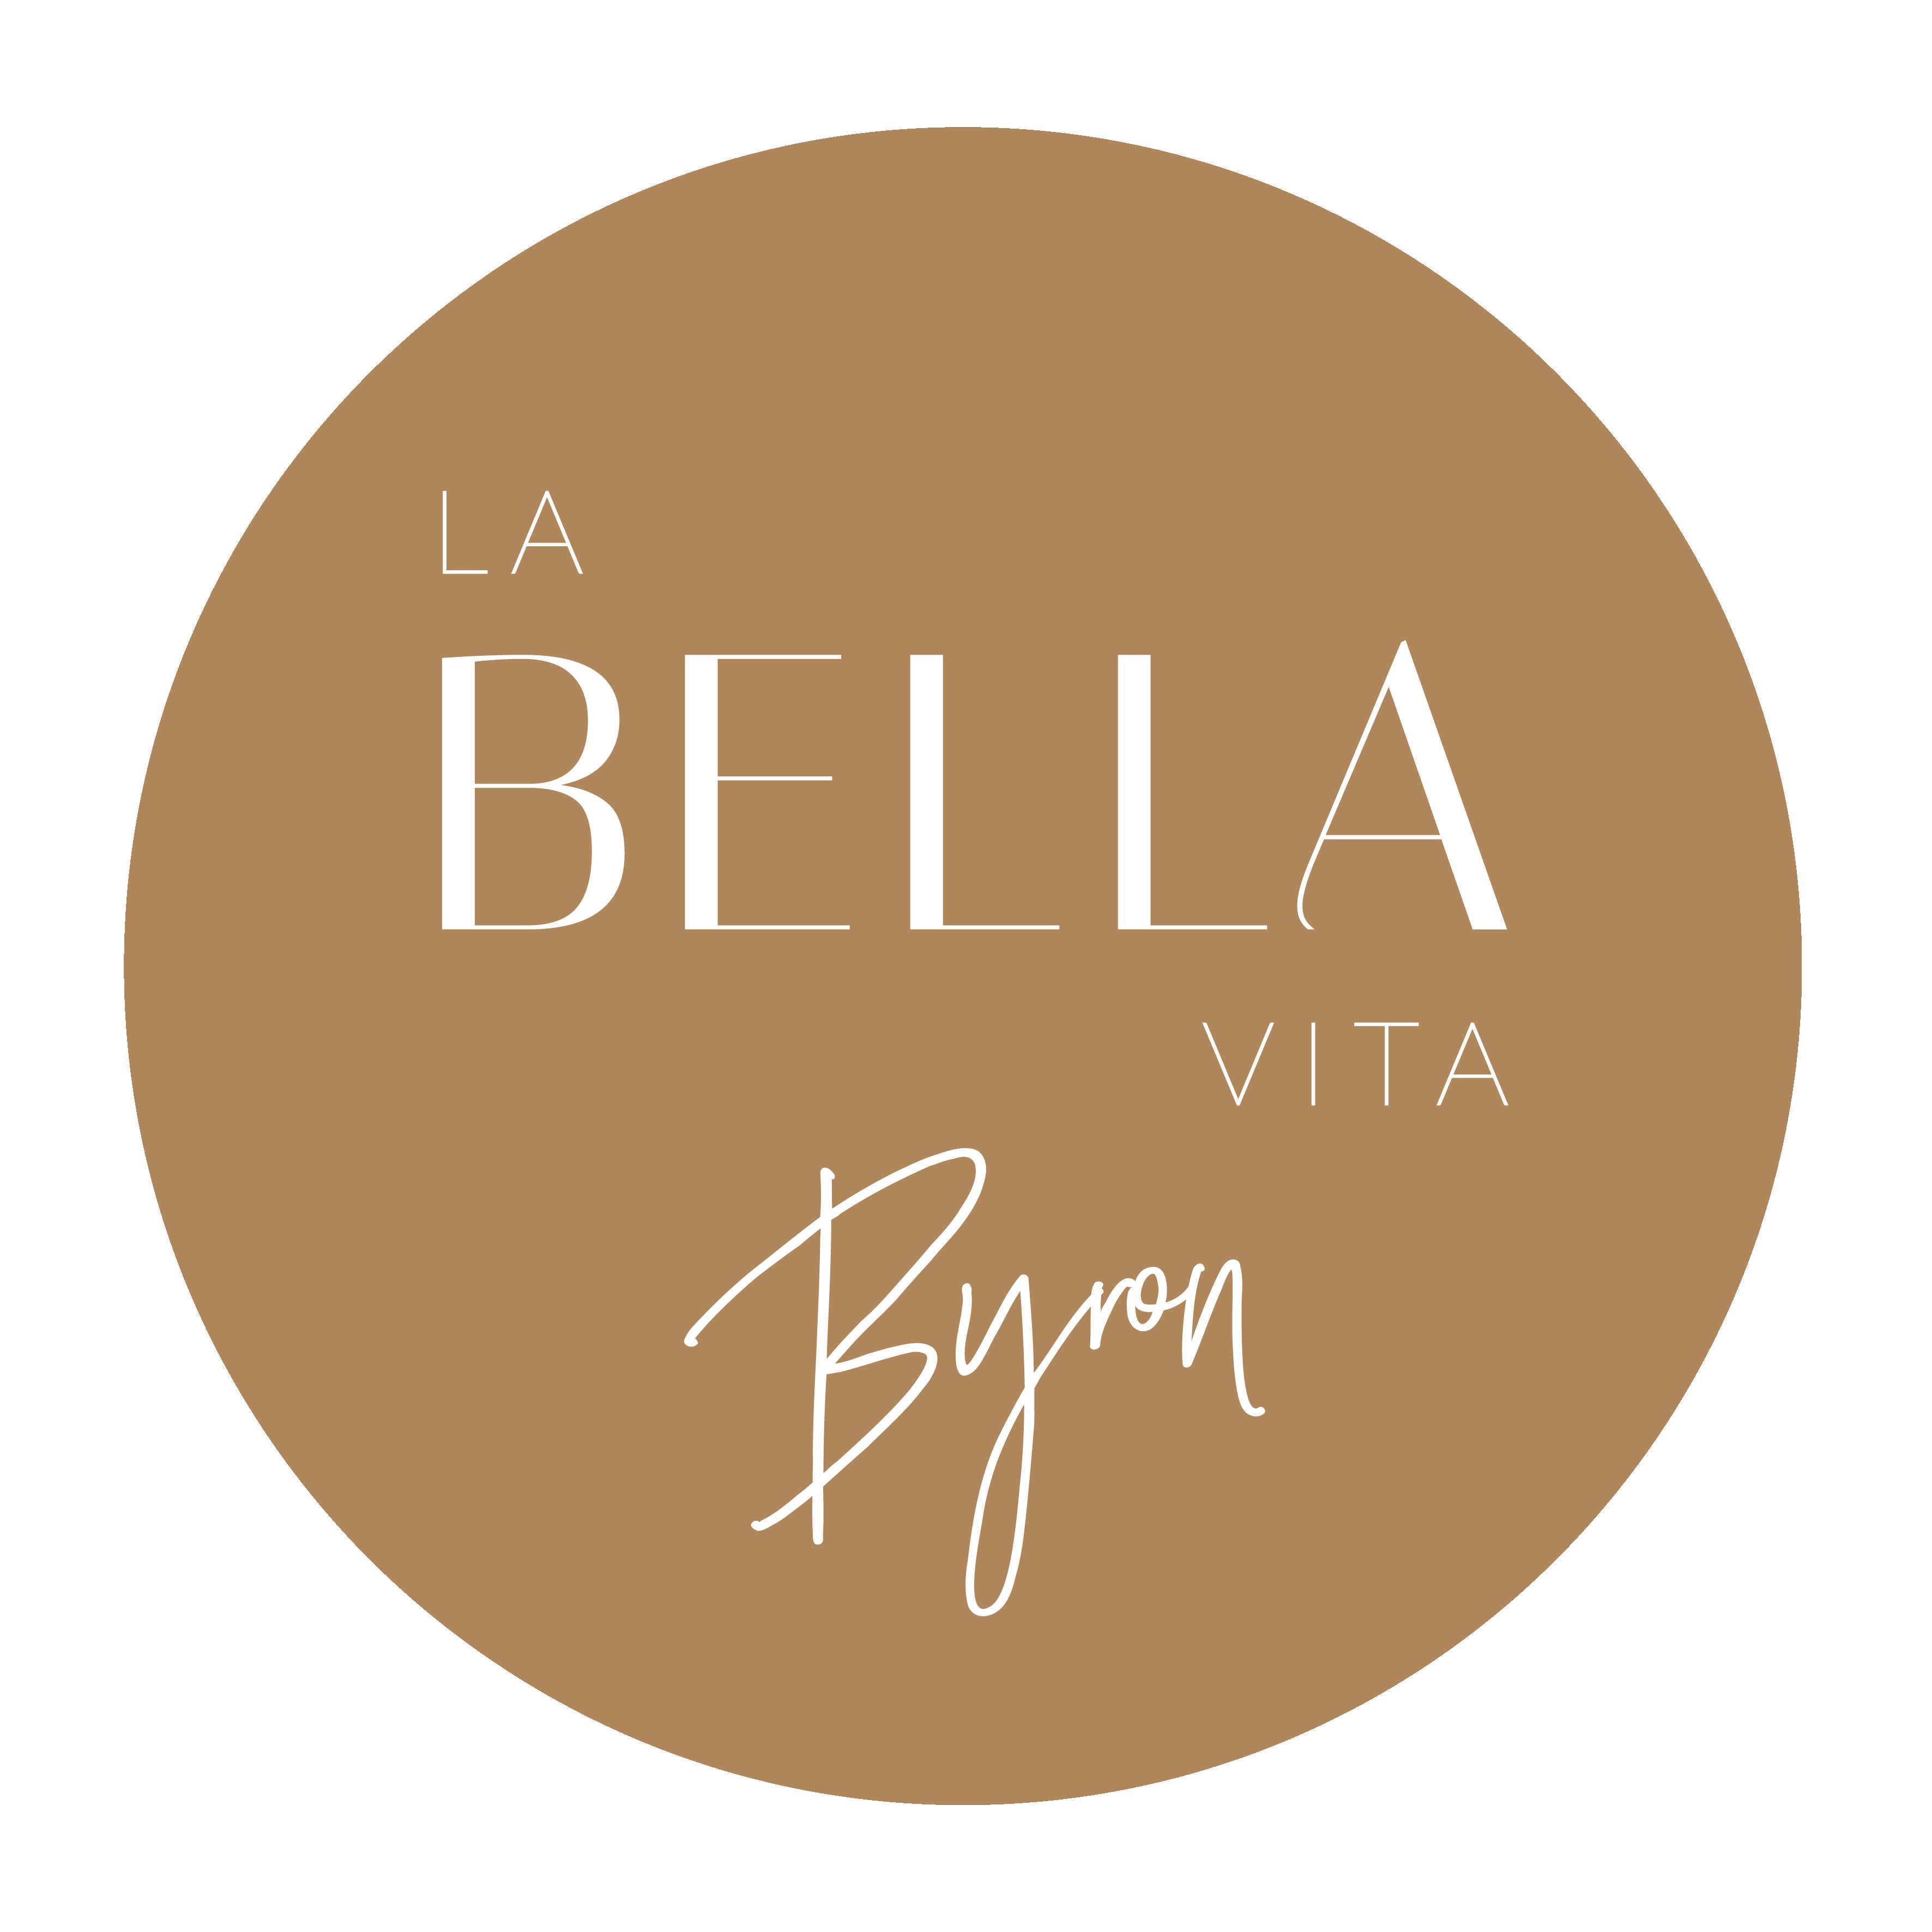 La Bella Vita | Family or Large Group Accommodation Sleeps up to 13 Byron Bay NSW